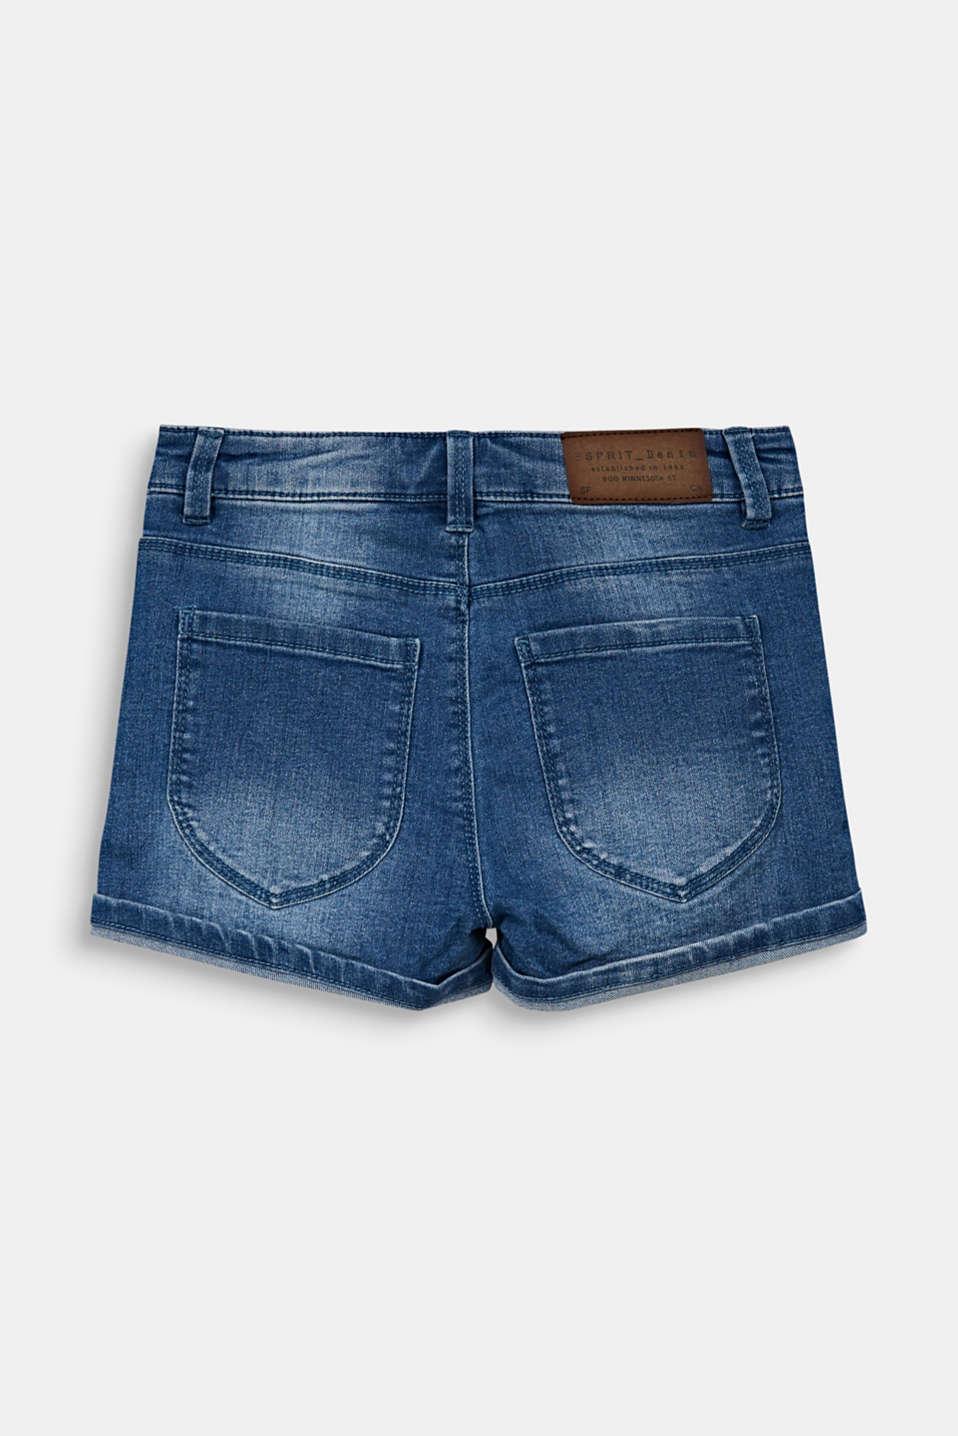 Denim shorts with an adjustable waistband, LCMEDIUM WASH DE, detail image number 1